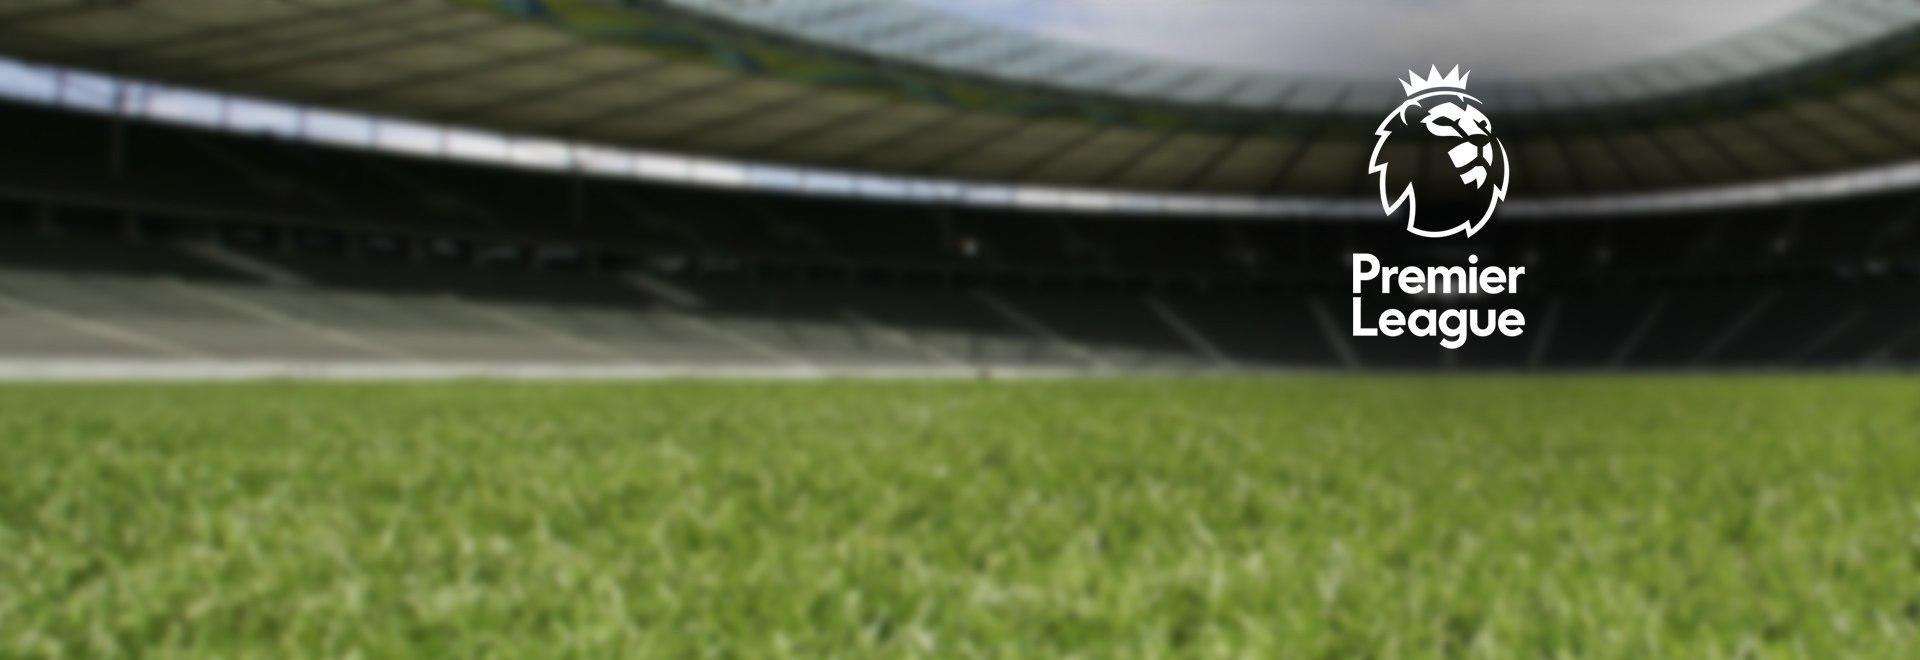 Burnley - Manchester United. 1a g.